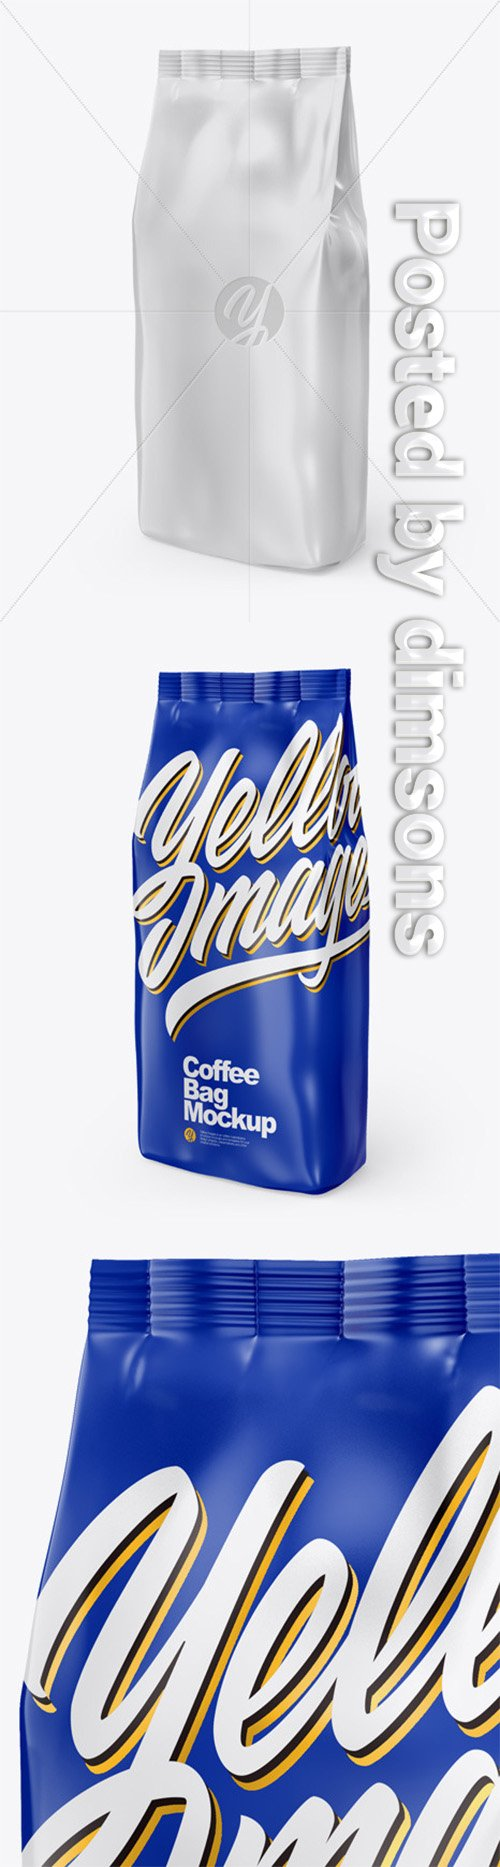 Glossy Bag Mockup 50551 TIF